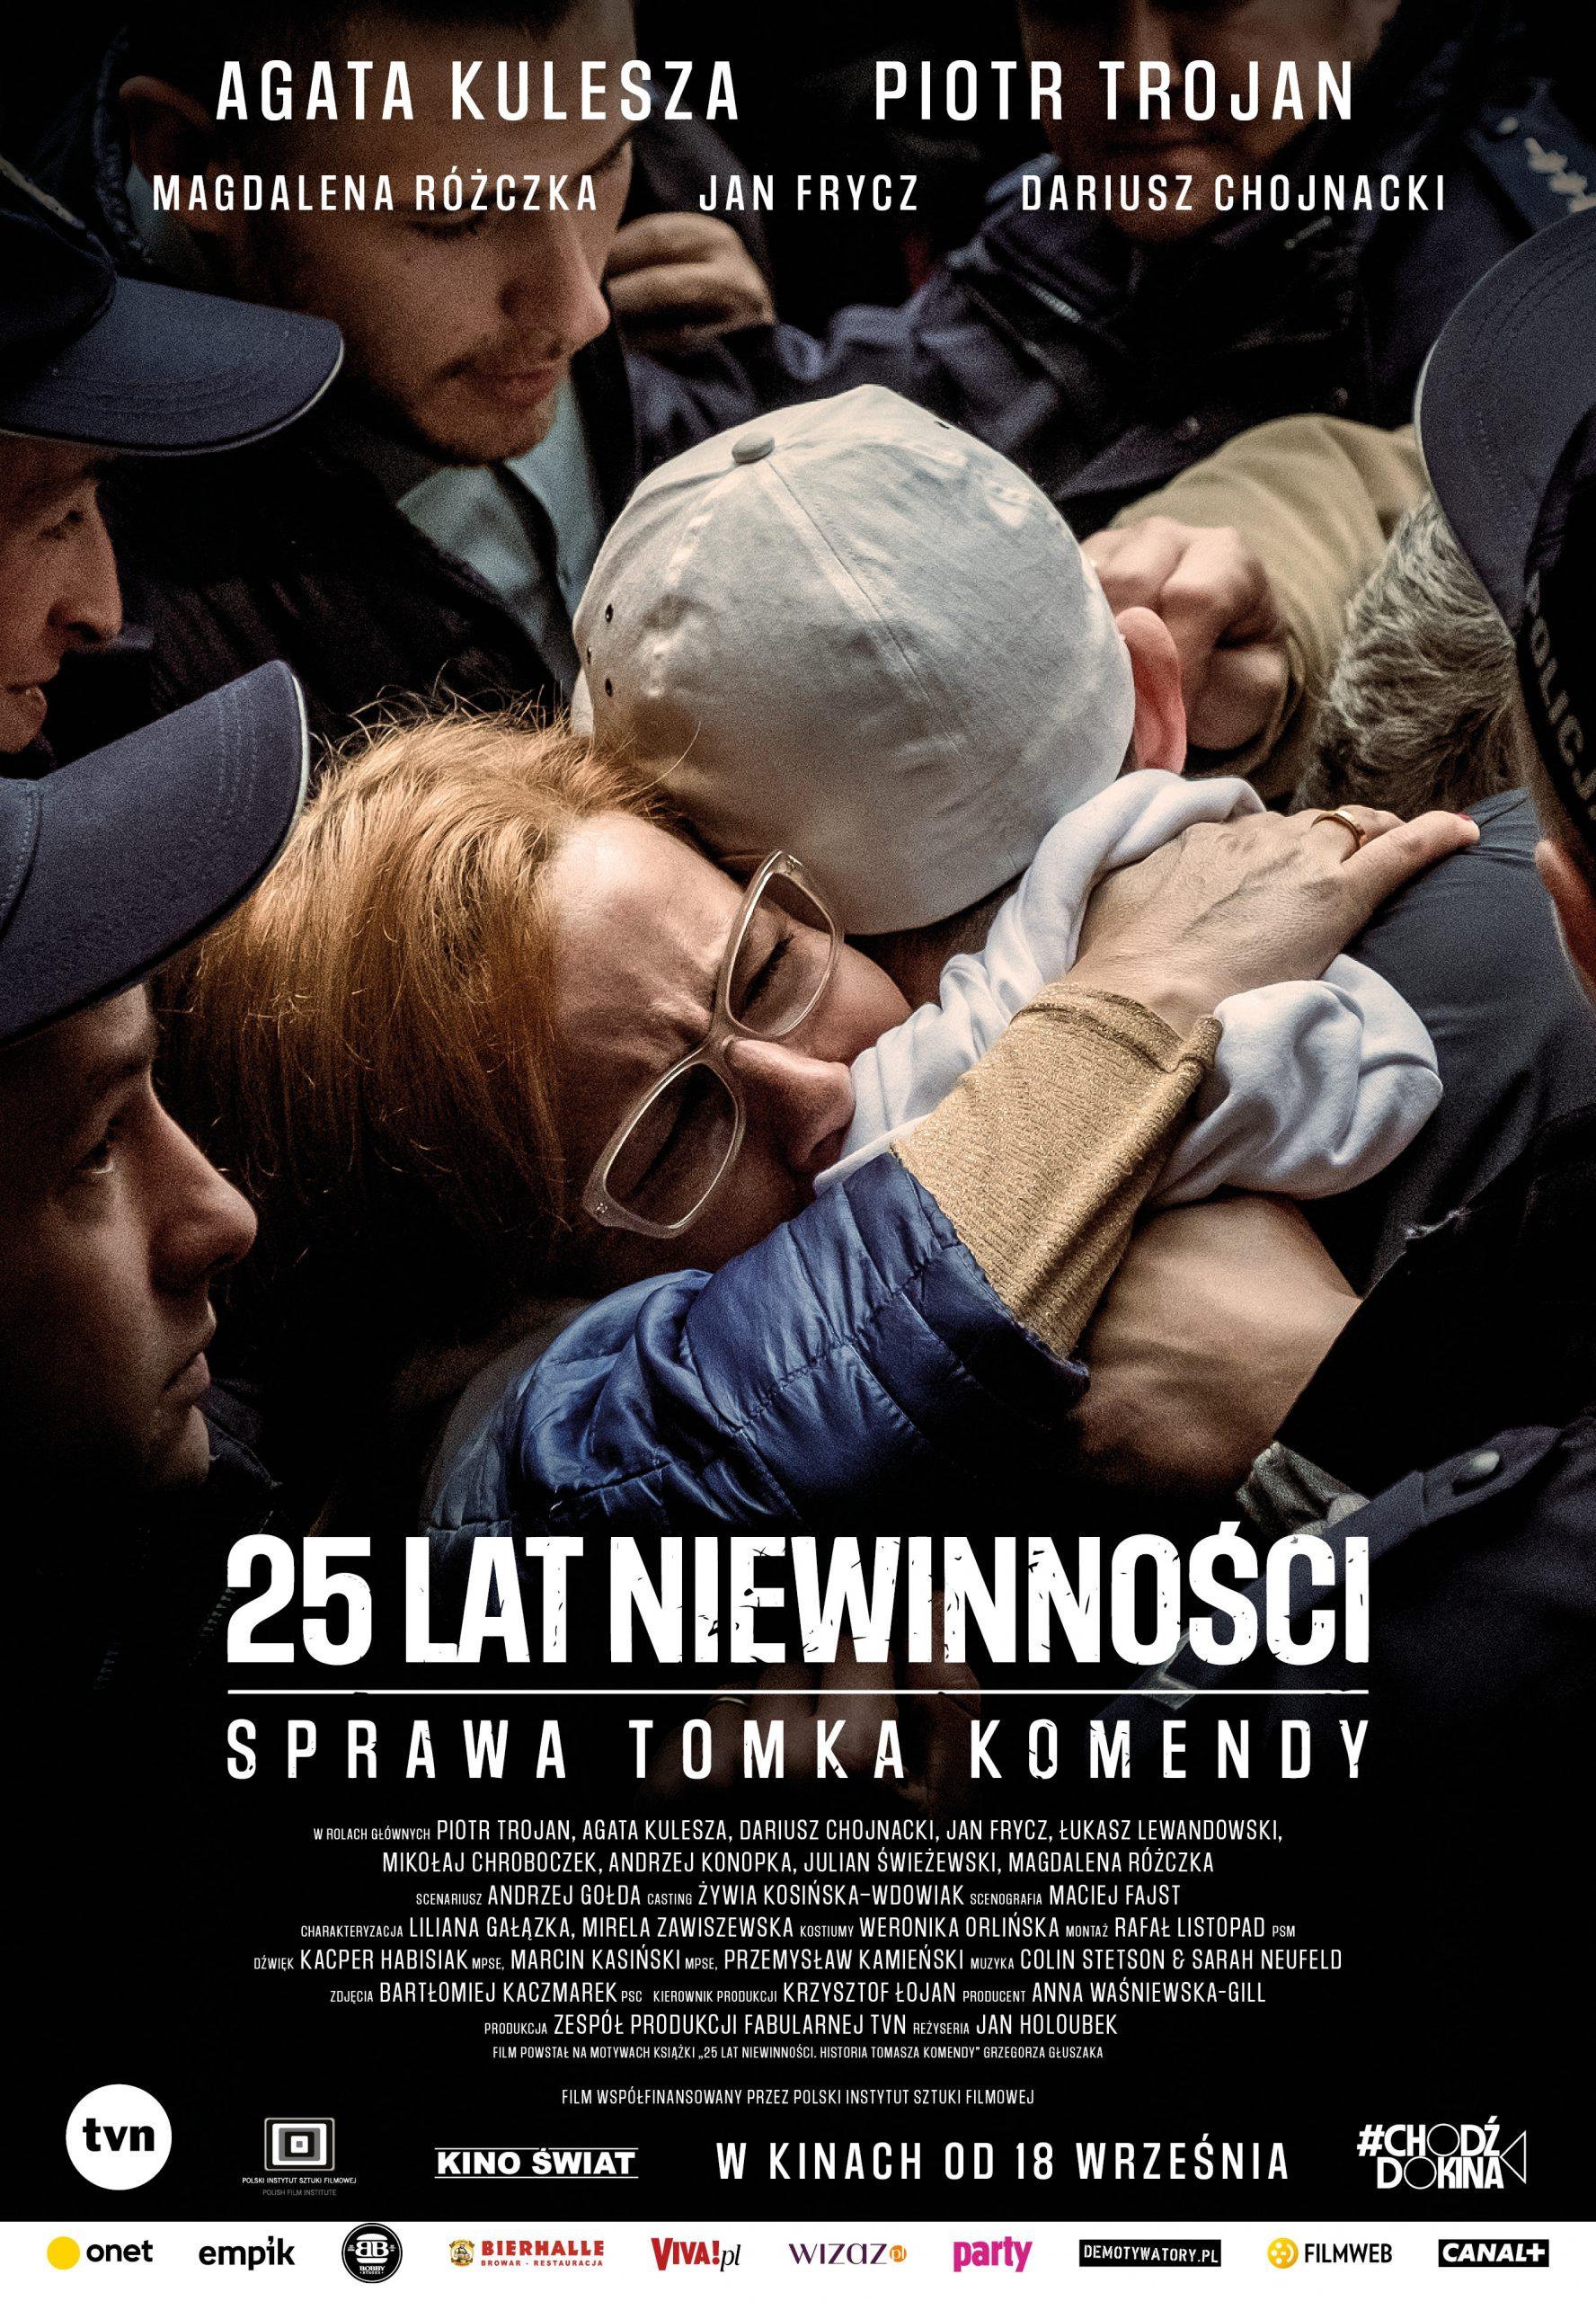 25 LAT NIEWINNOSCI - PLAKAT